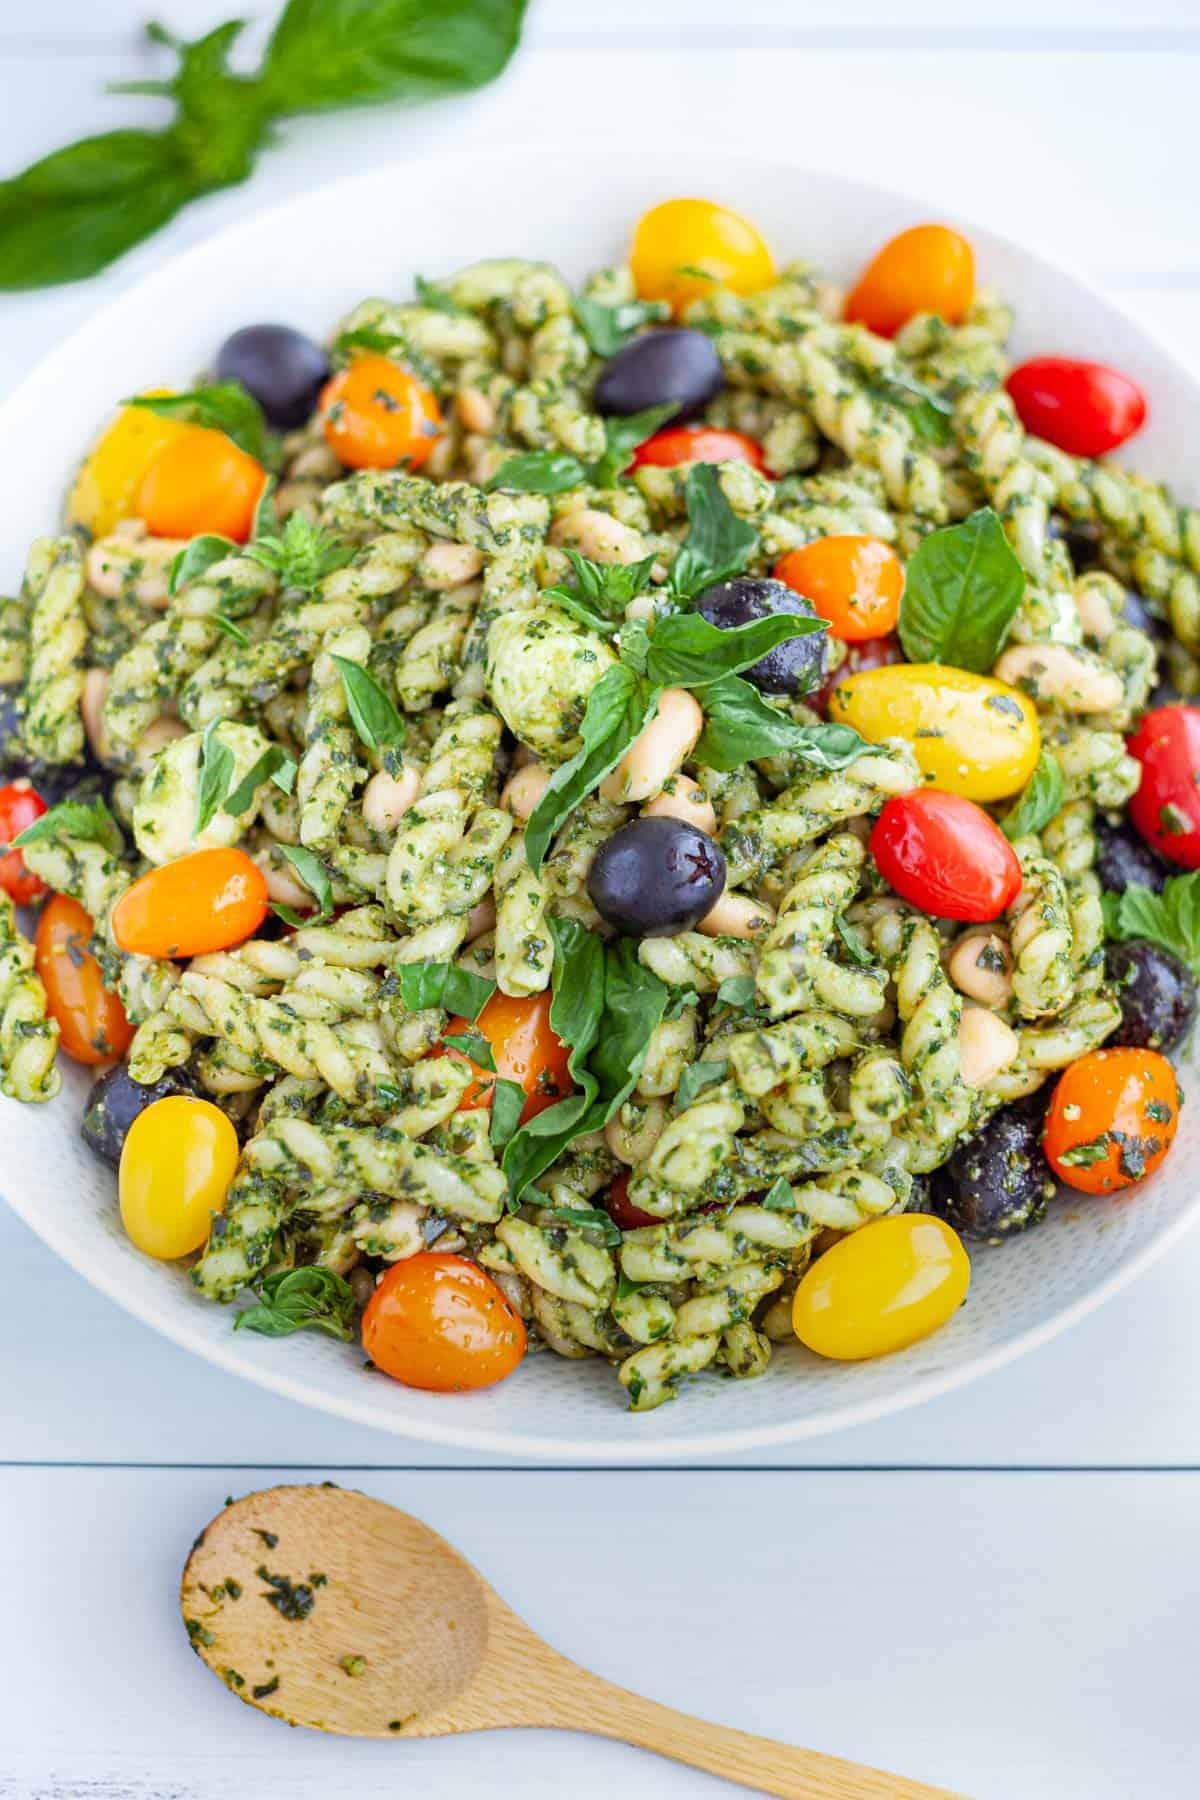 Spinach Pesto Pasta Salad with White Beans, Mozzarella and Tomatoes